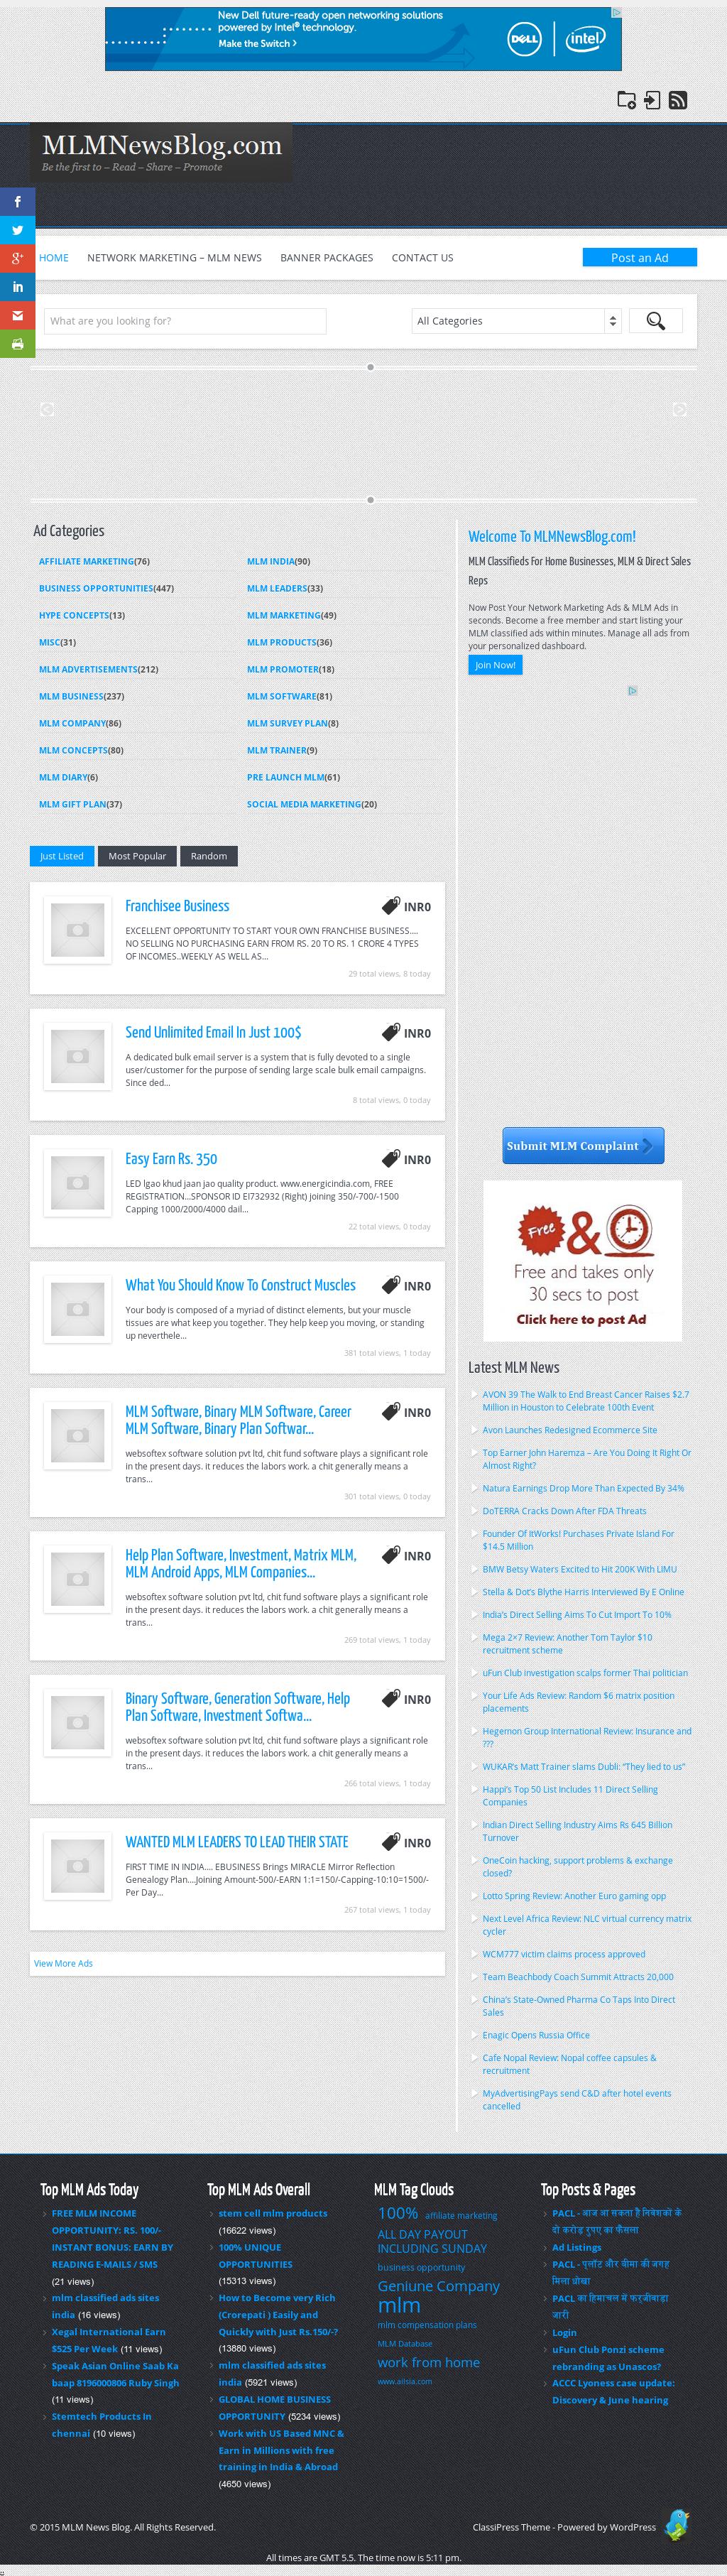 Owler Reports - Mlmnewsblog Blog OneLife suspend OneCoin